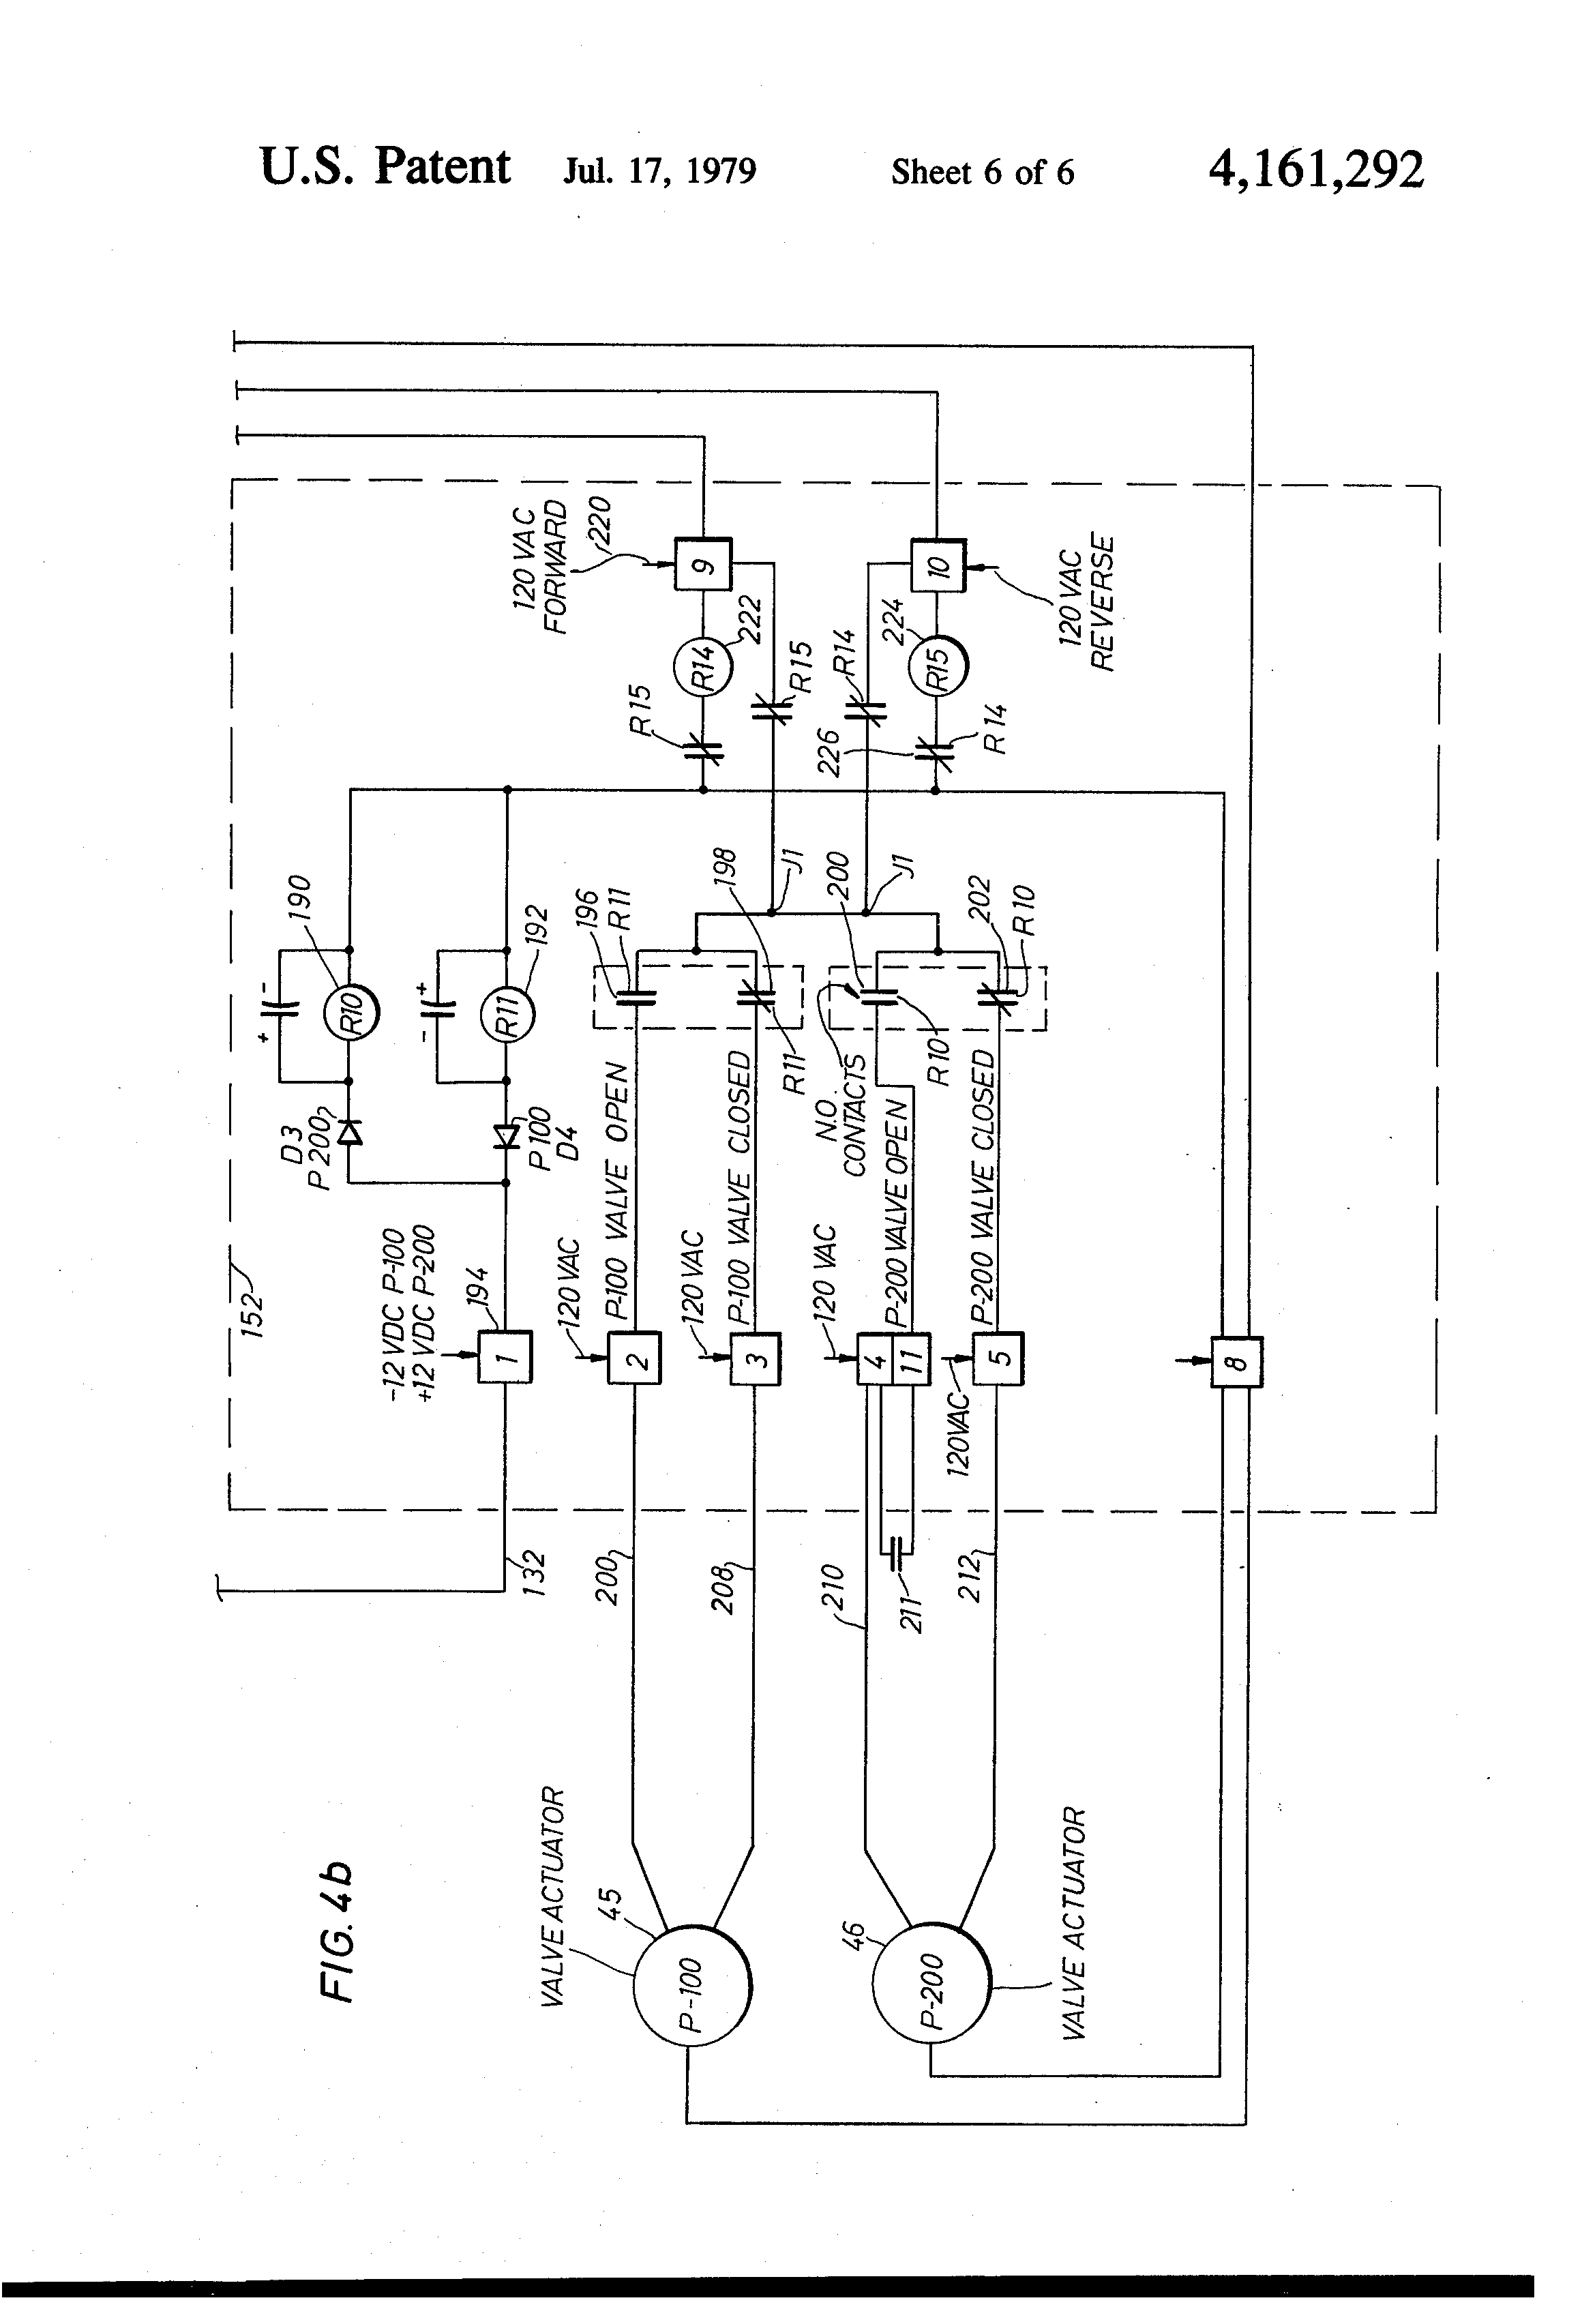 reinke wiring diagram   21 wiring diagram images